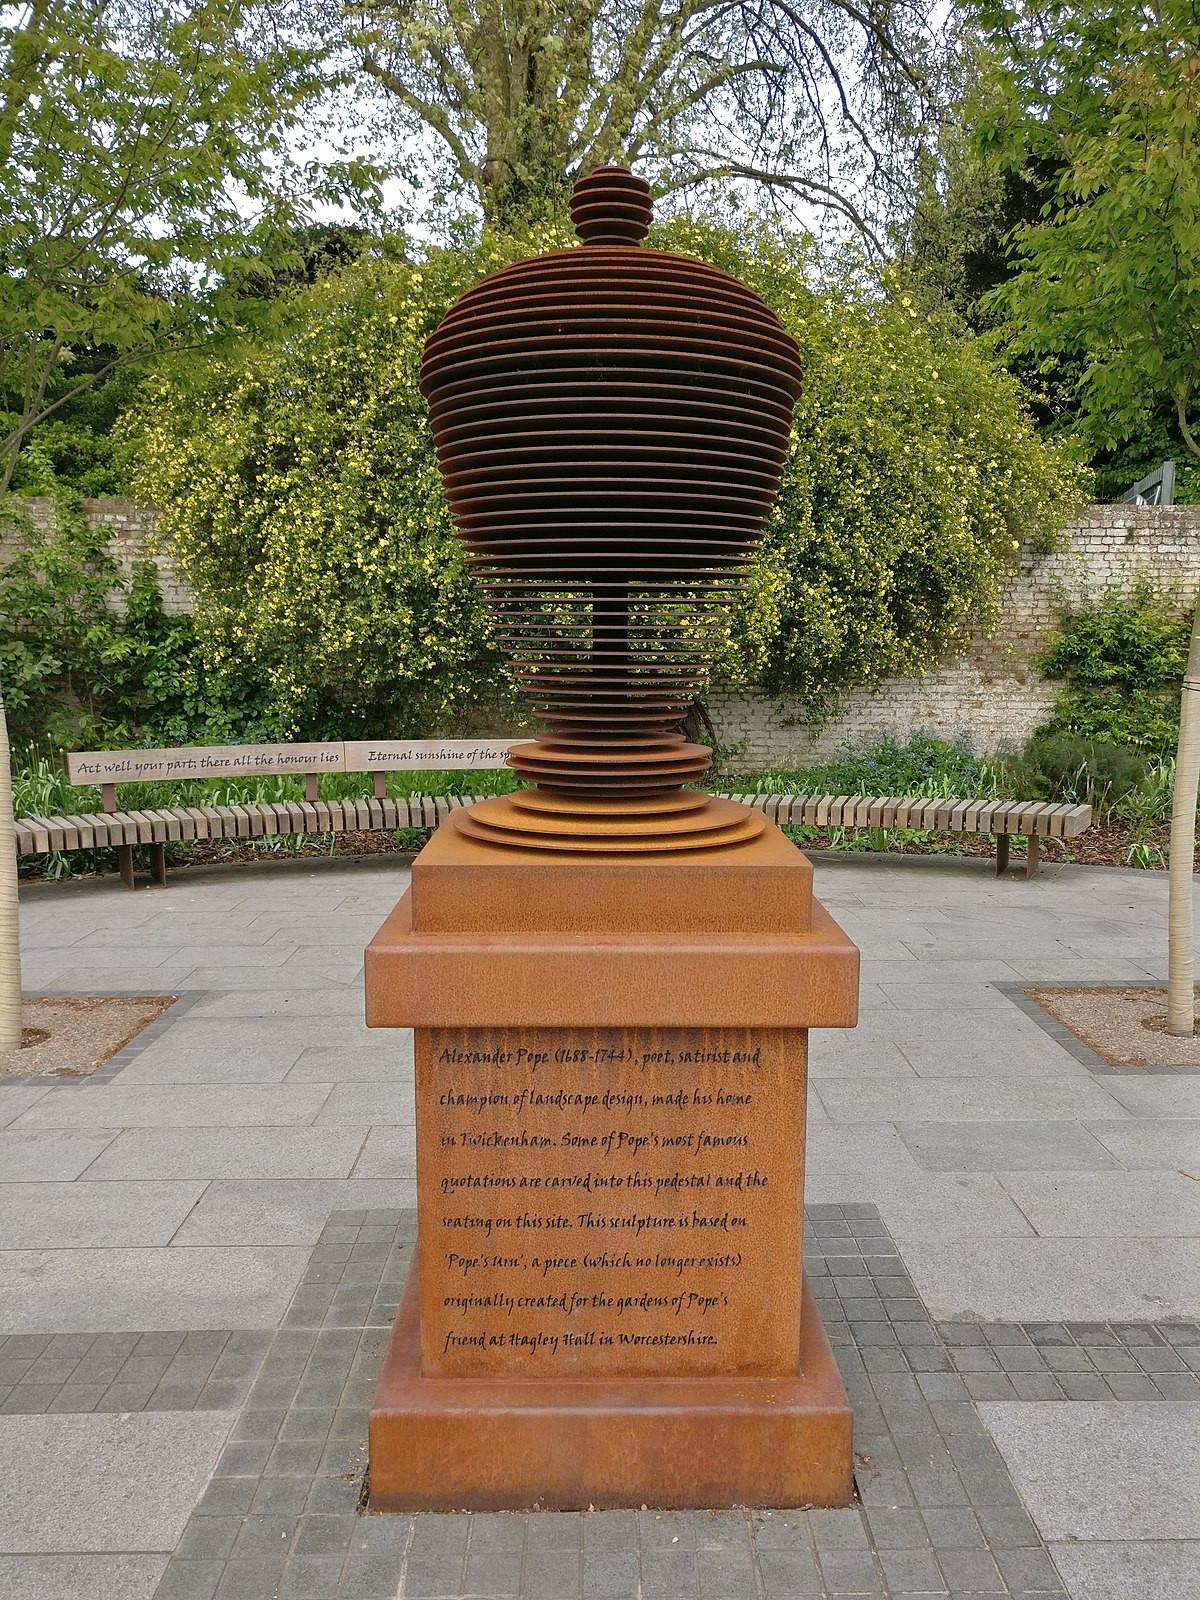 princess house heritage large vase of popes urn wikipedia with regard to 1200px popes urn twickenham